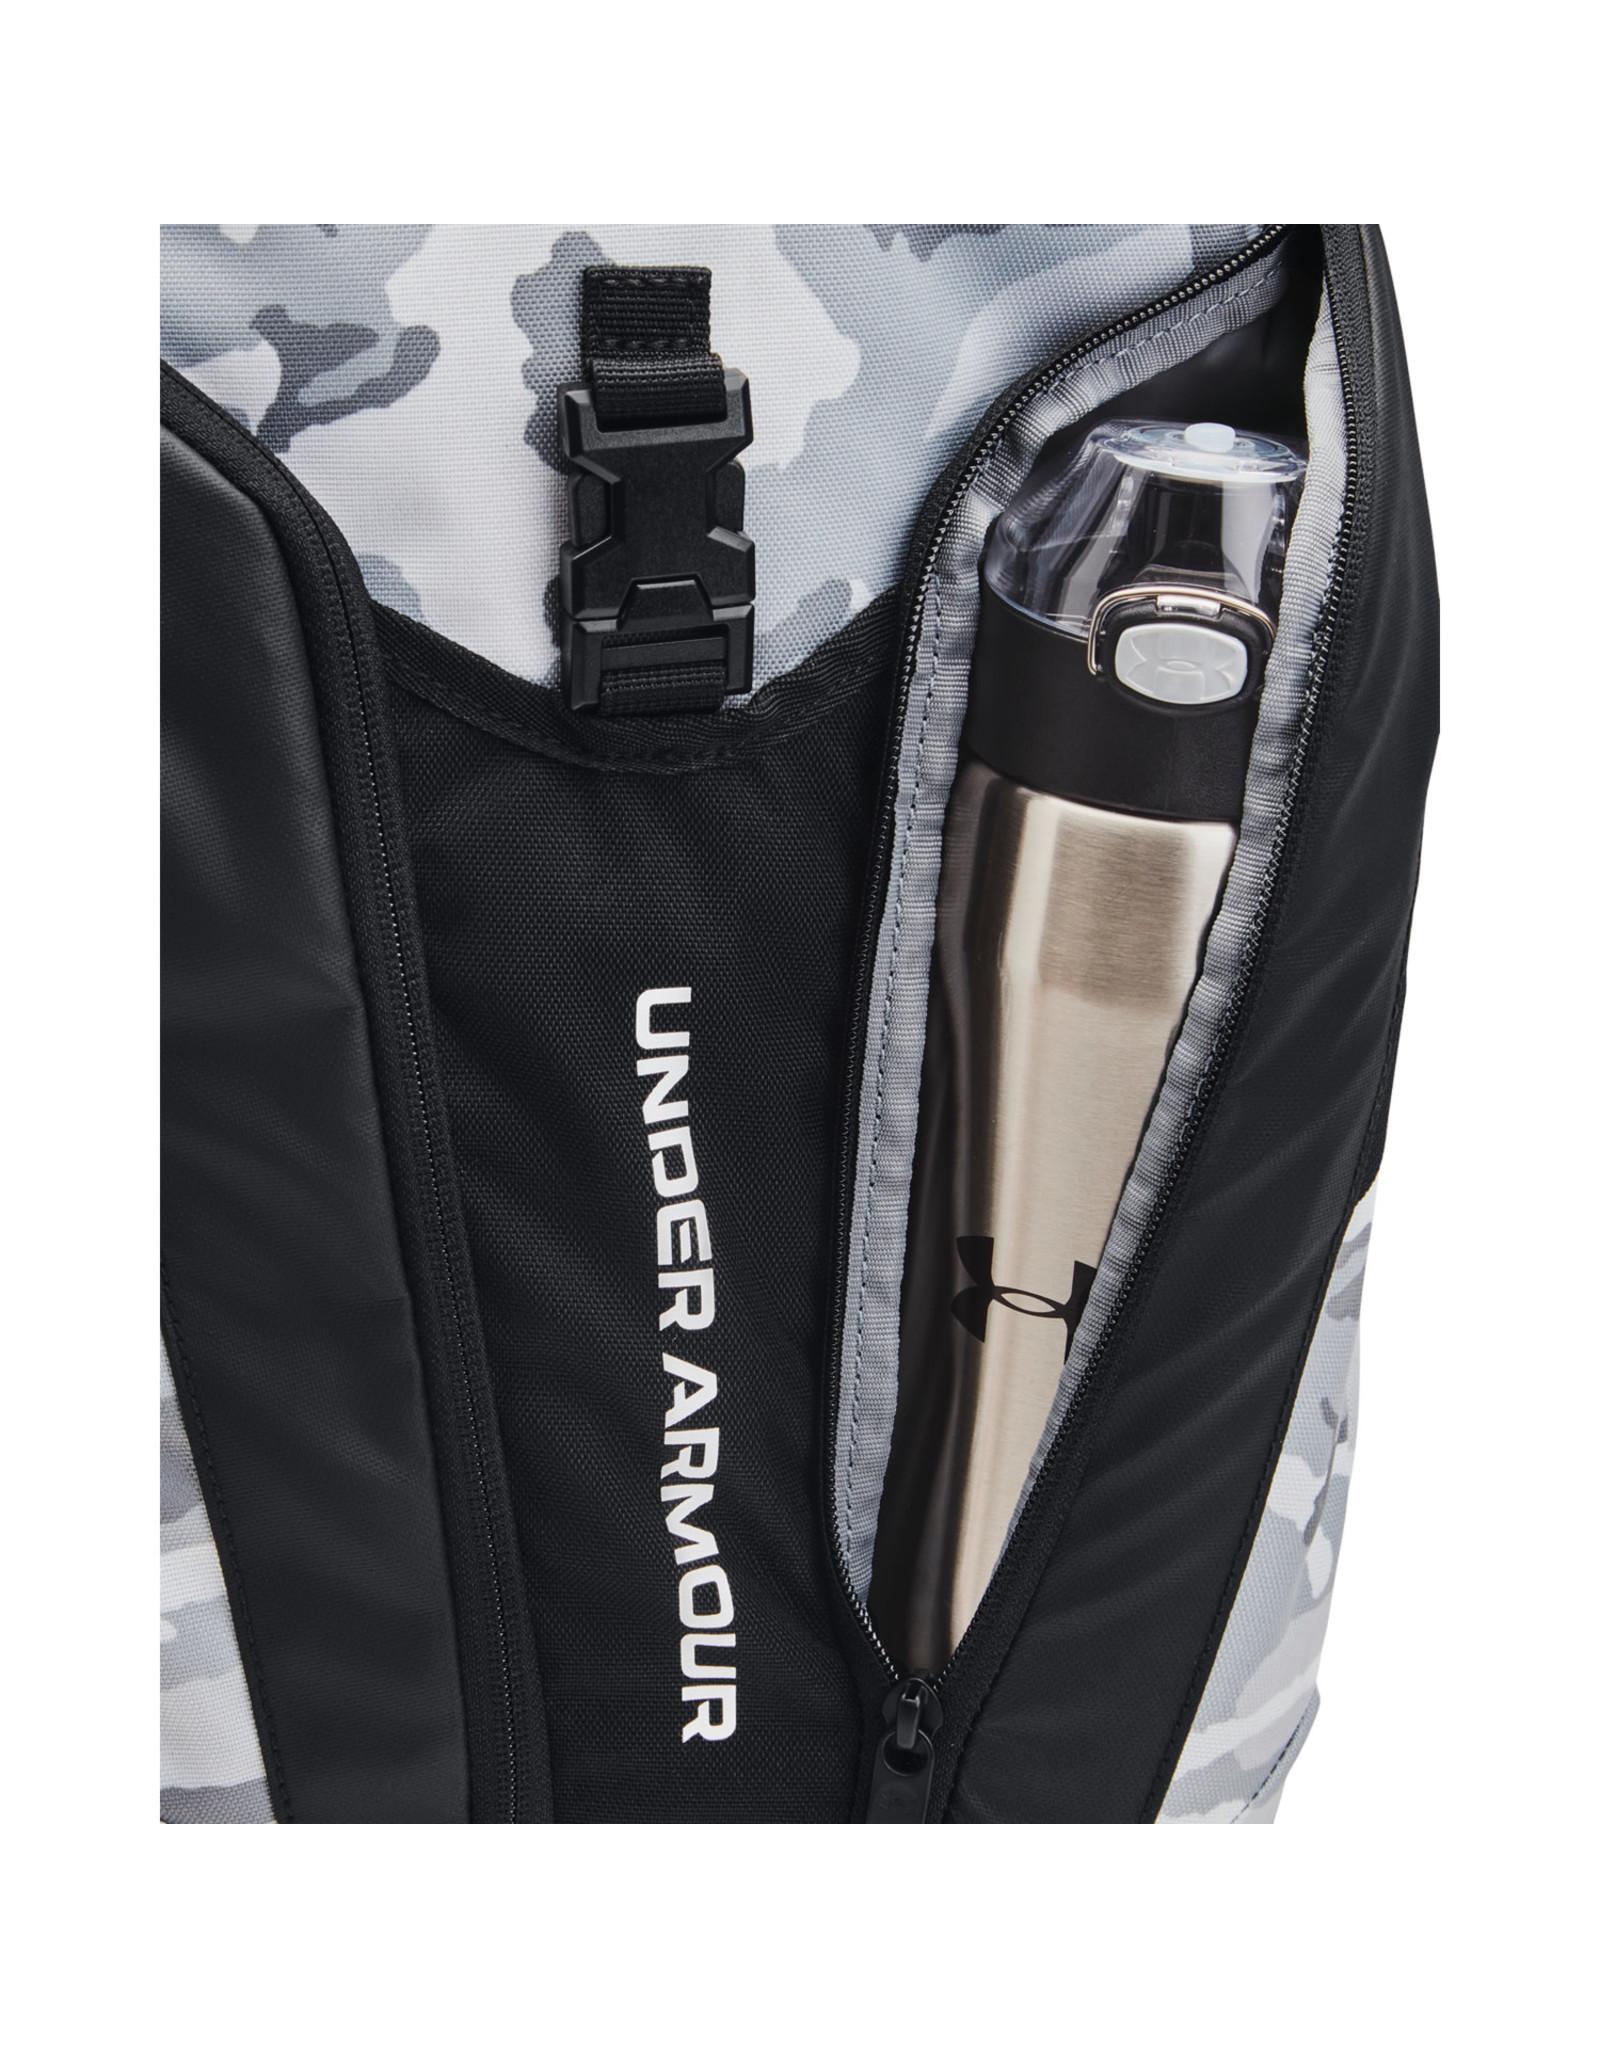 Under Armour UA Hustle Pro Backpack-White